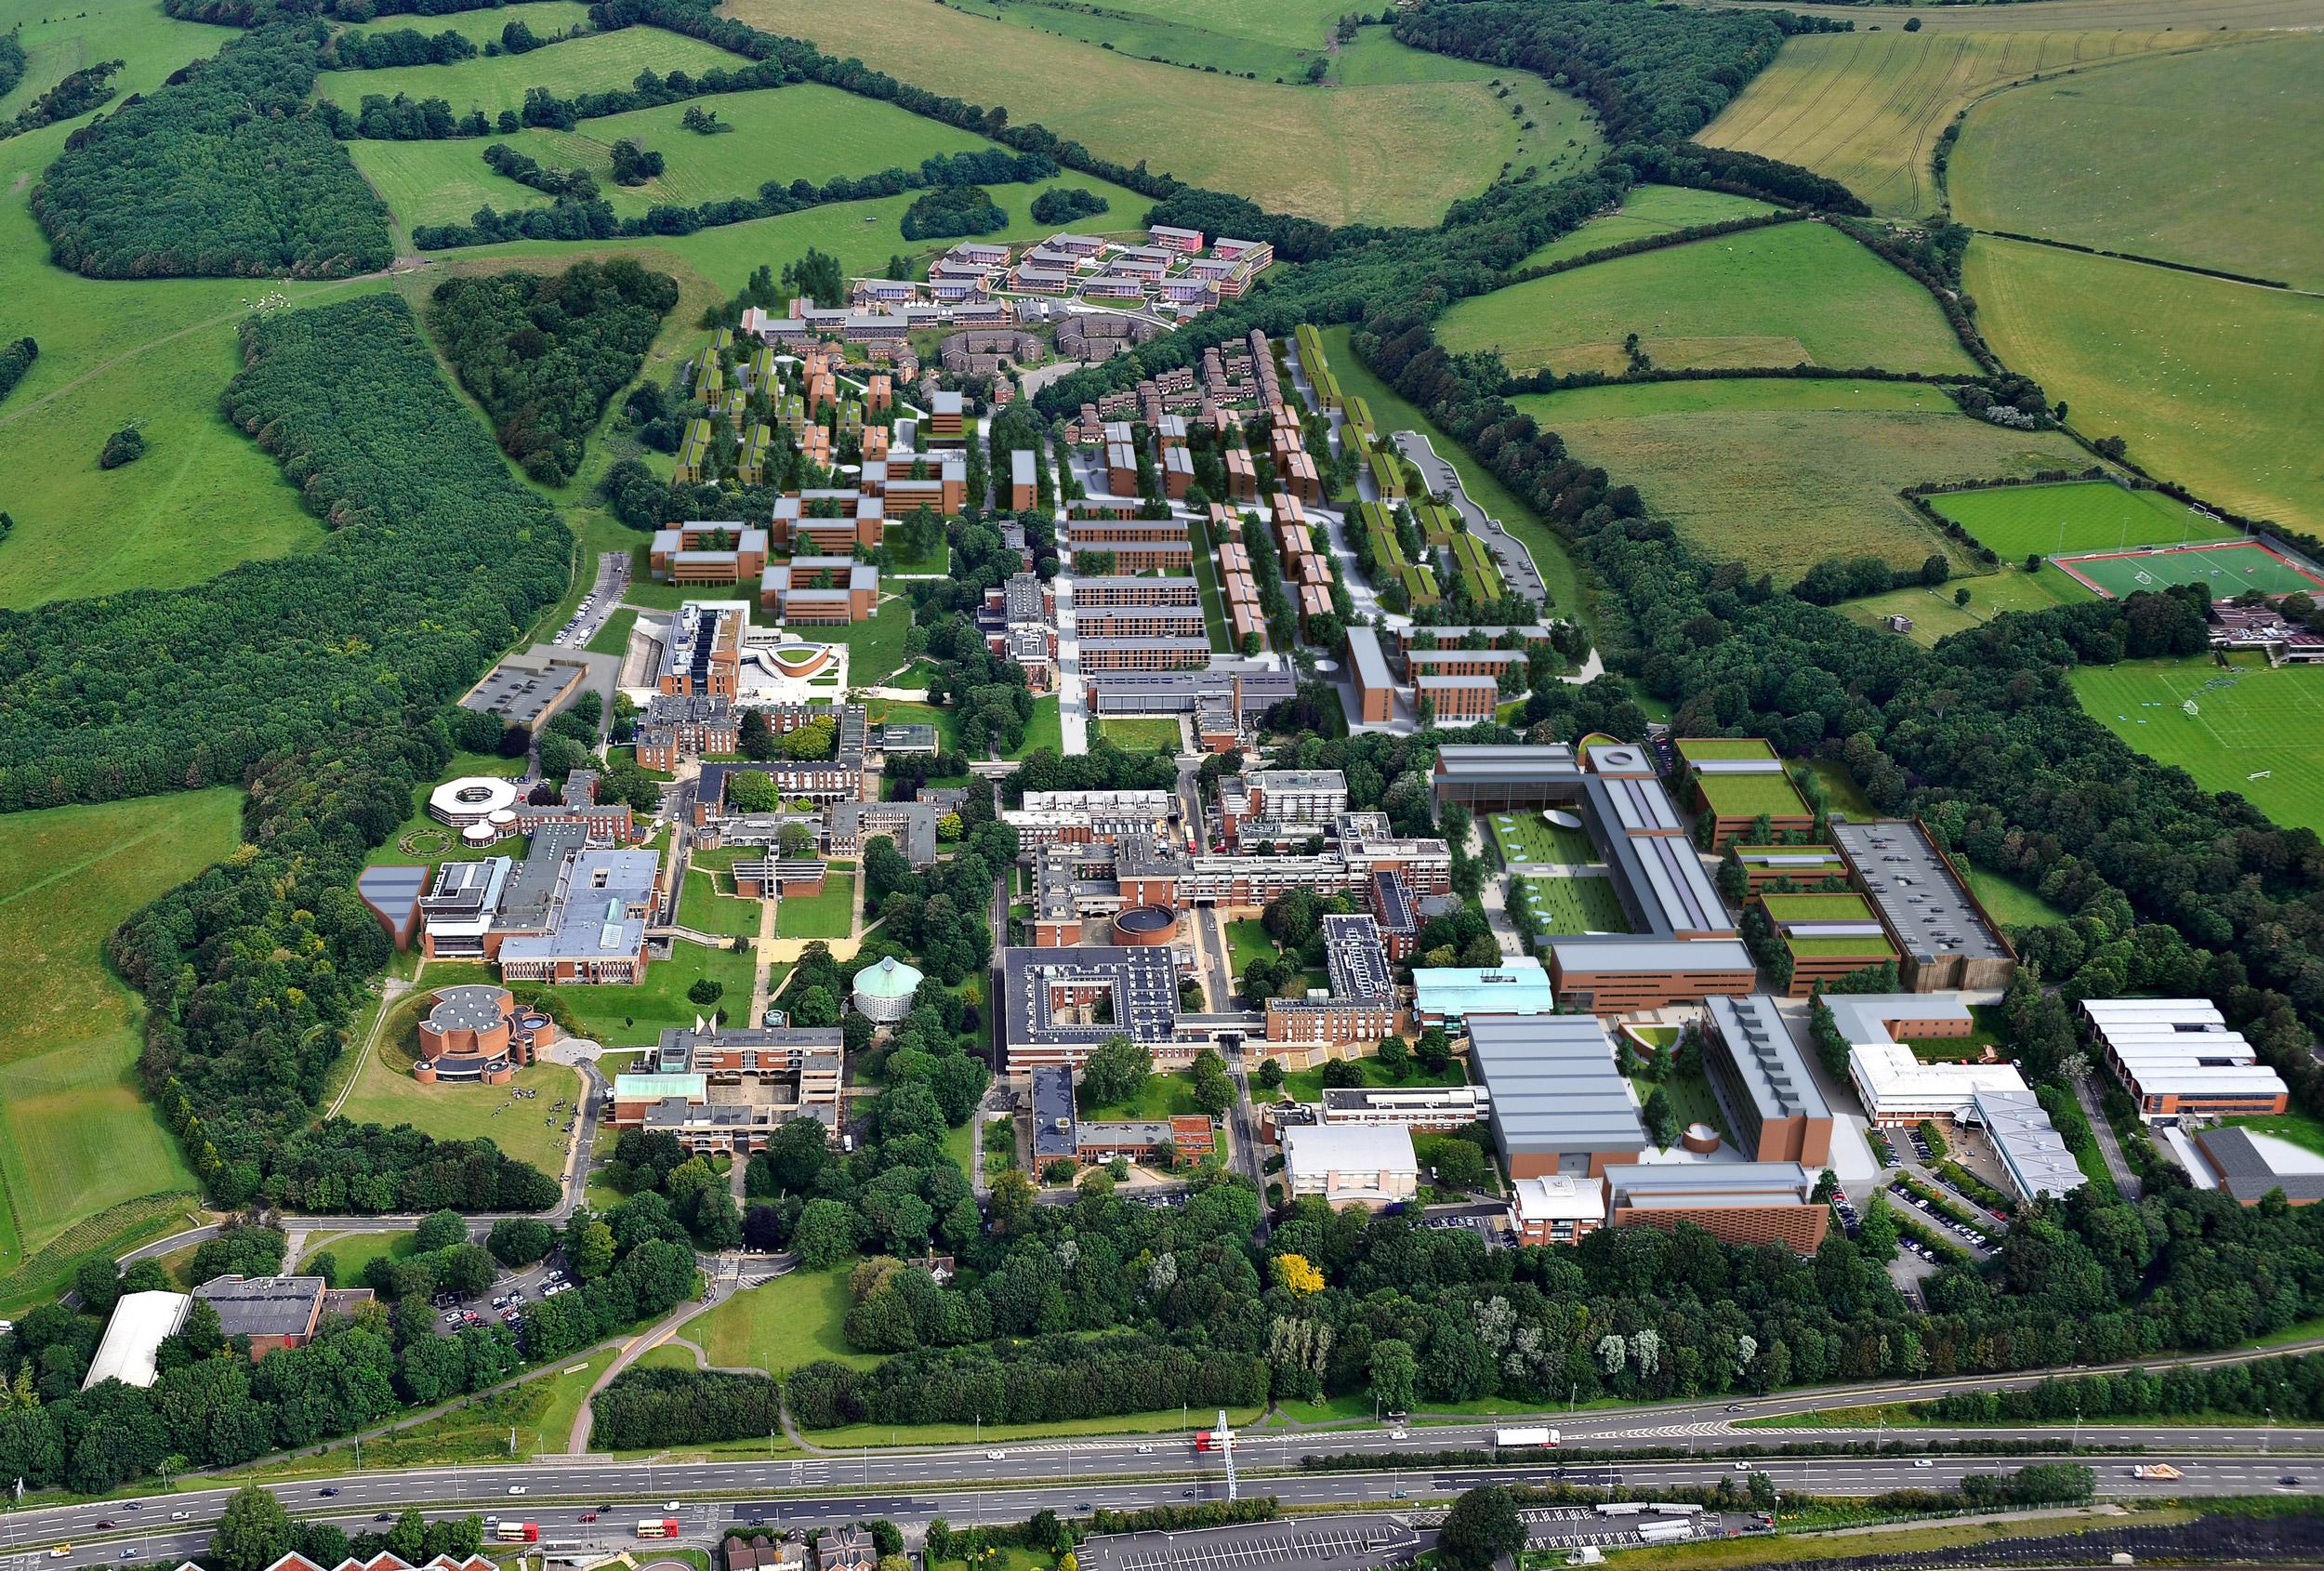 University of Sussex Campus Masterplan